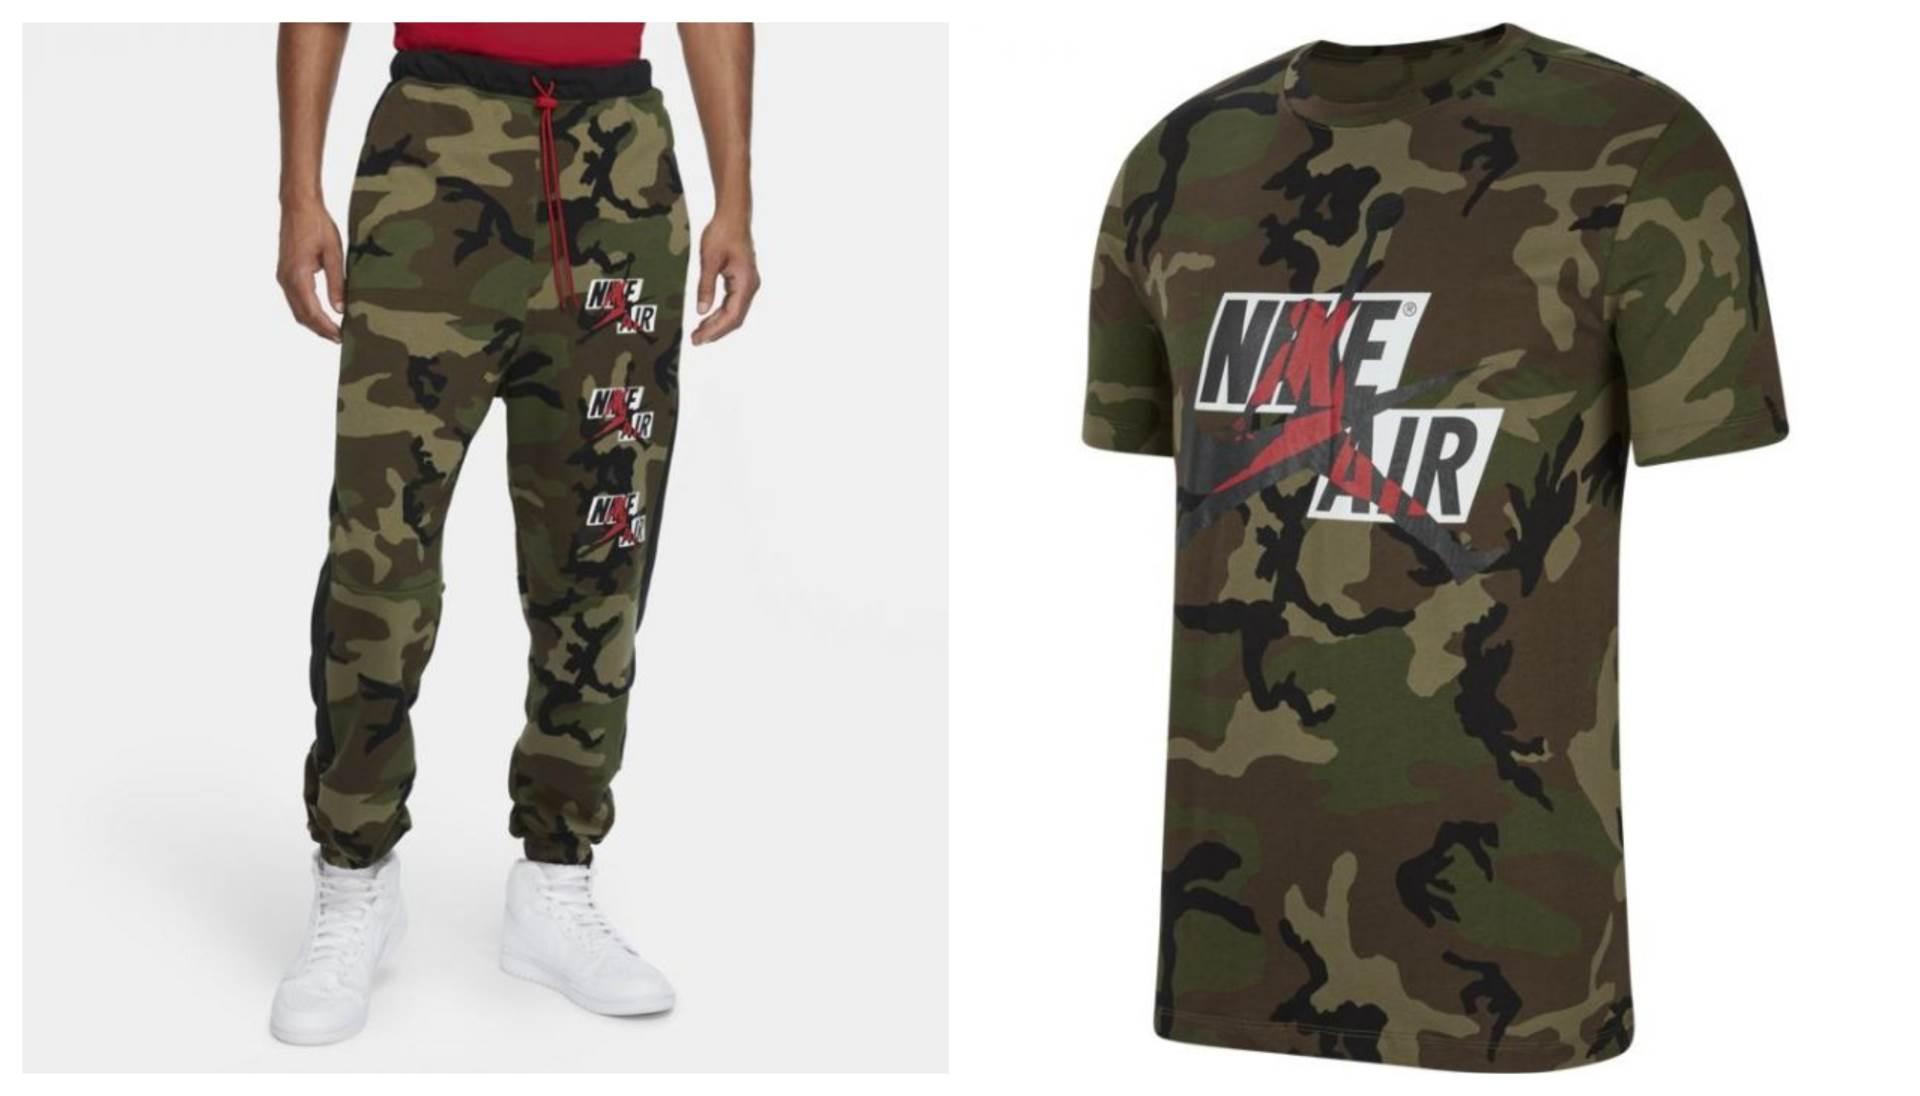 Nike Jordan Classics Camo muške hlače, the athlete's foot, 299,95 kn; Nike Jordan Jumpman Classics Camo, muška majica, zelena, the athlete's foot, 209,97 kn